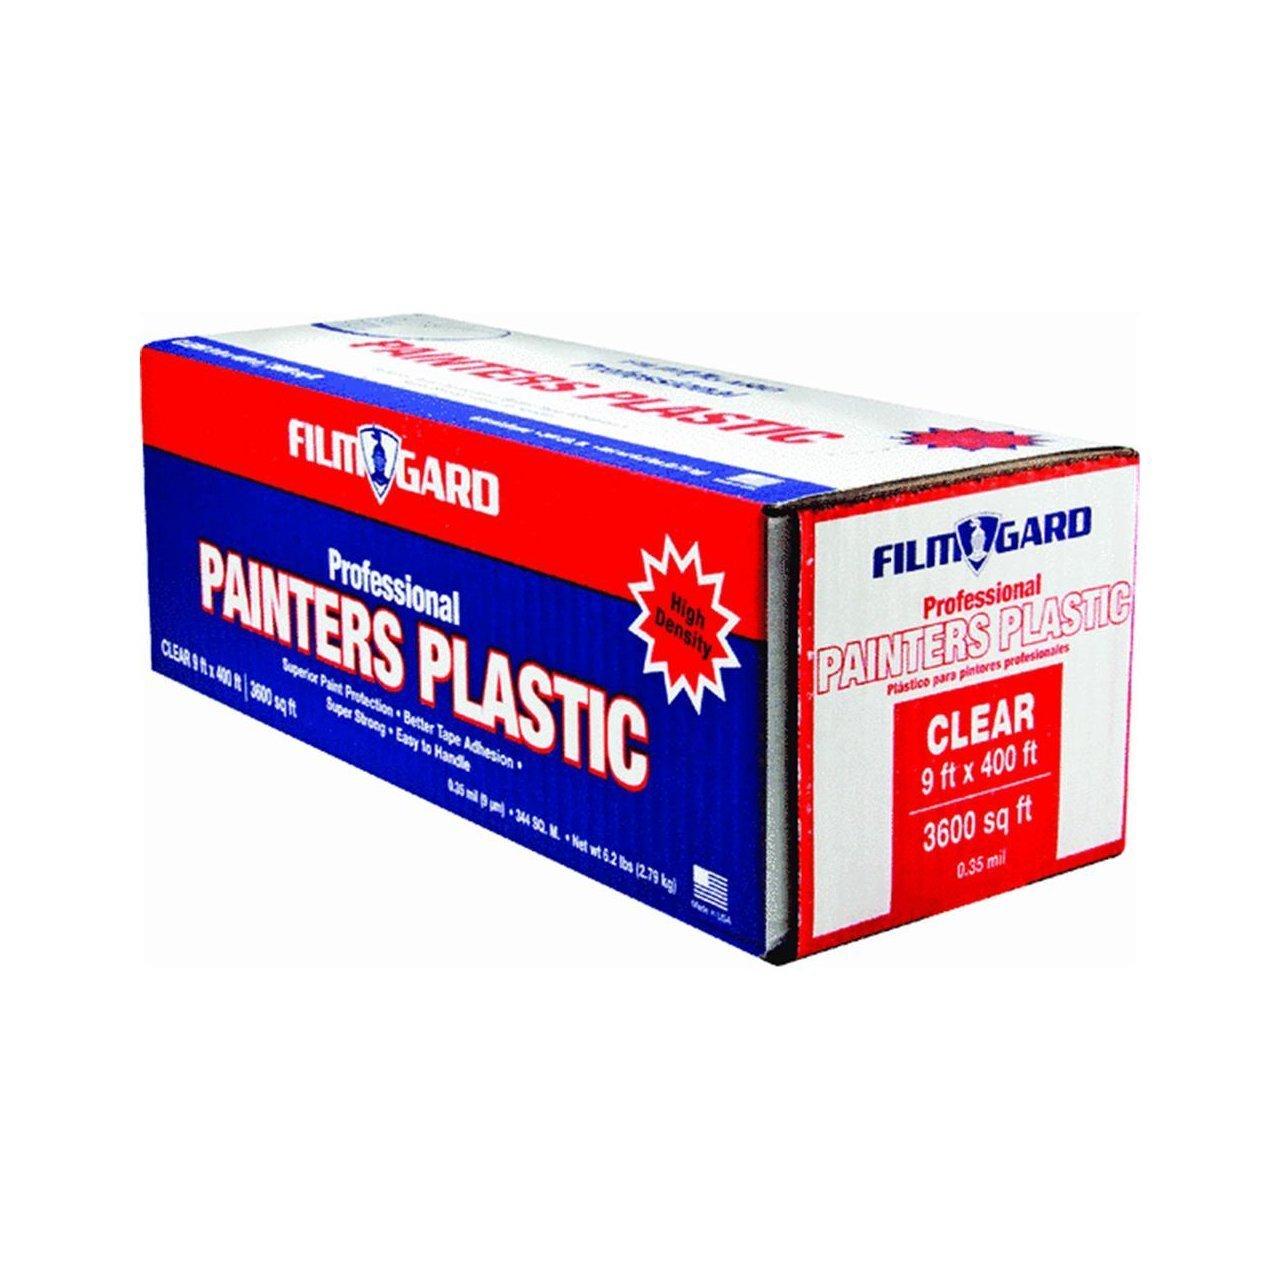 Berry Dealing full price reduction Plastics 626260 Film Gard Density Max 81% OFF Painte High Professional